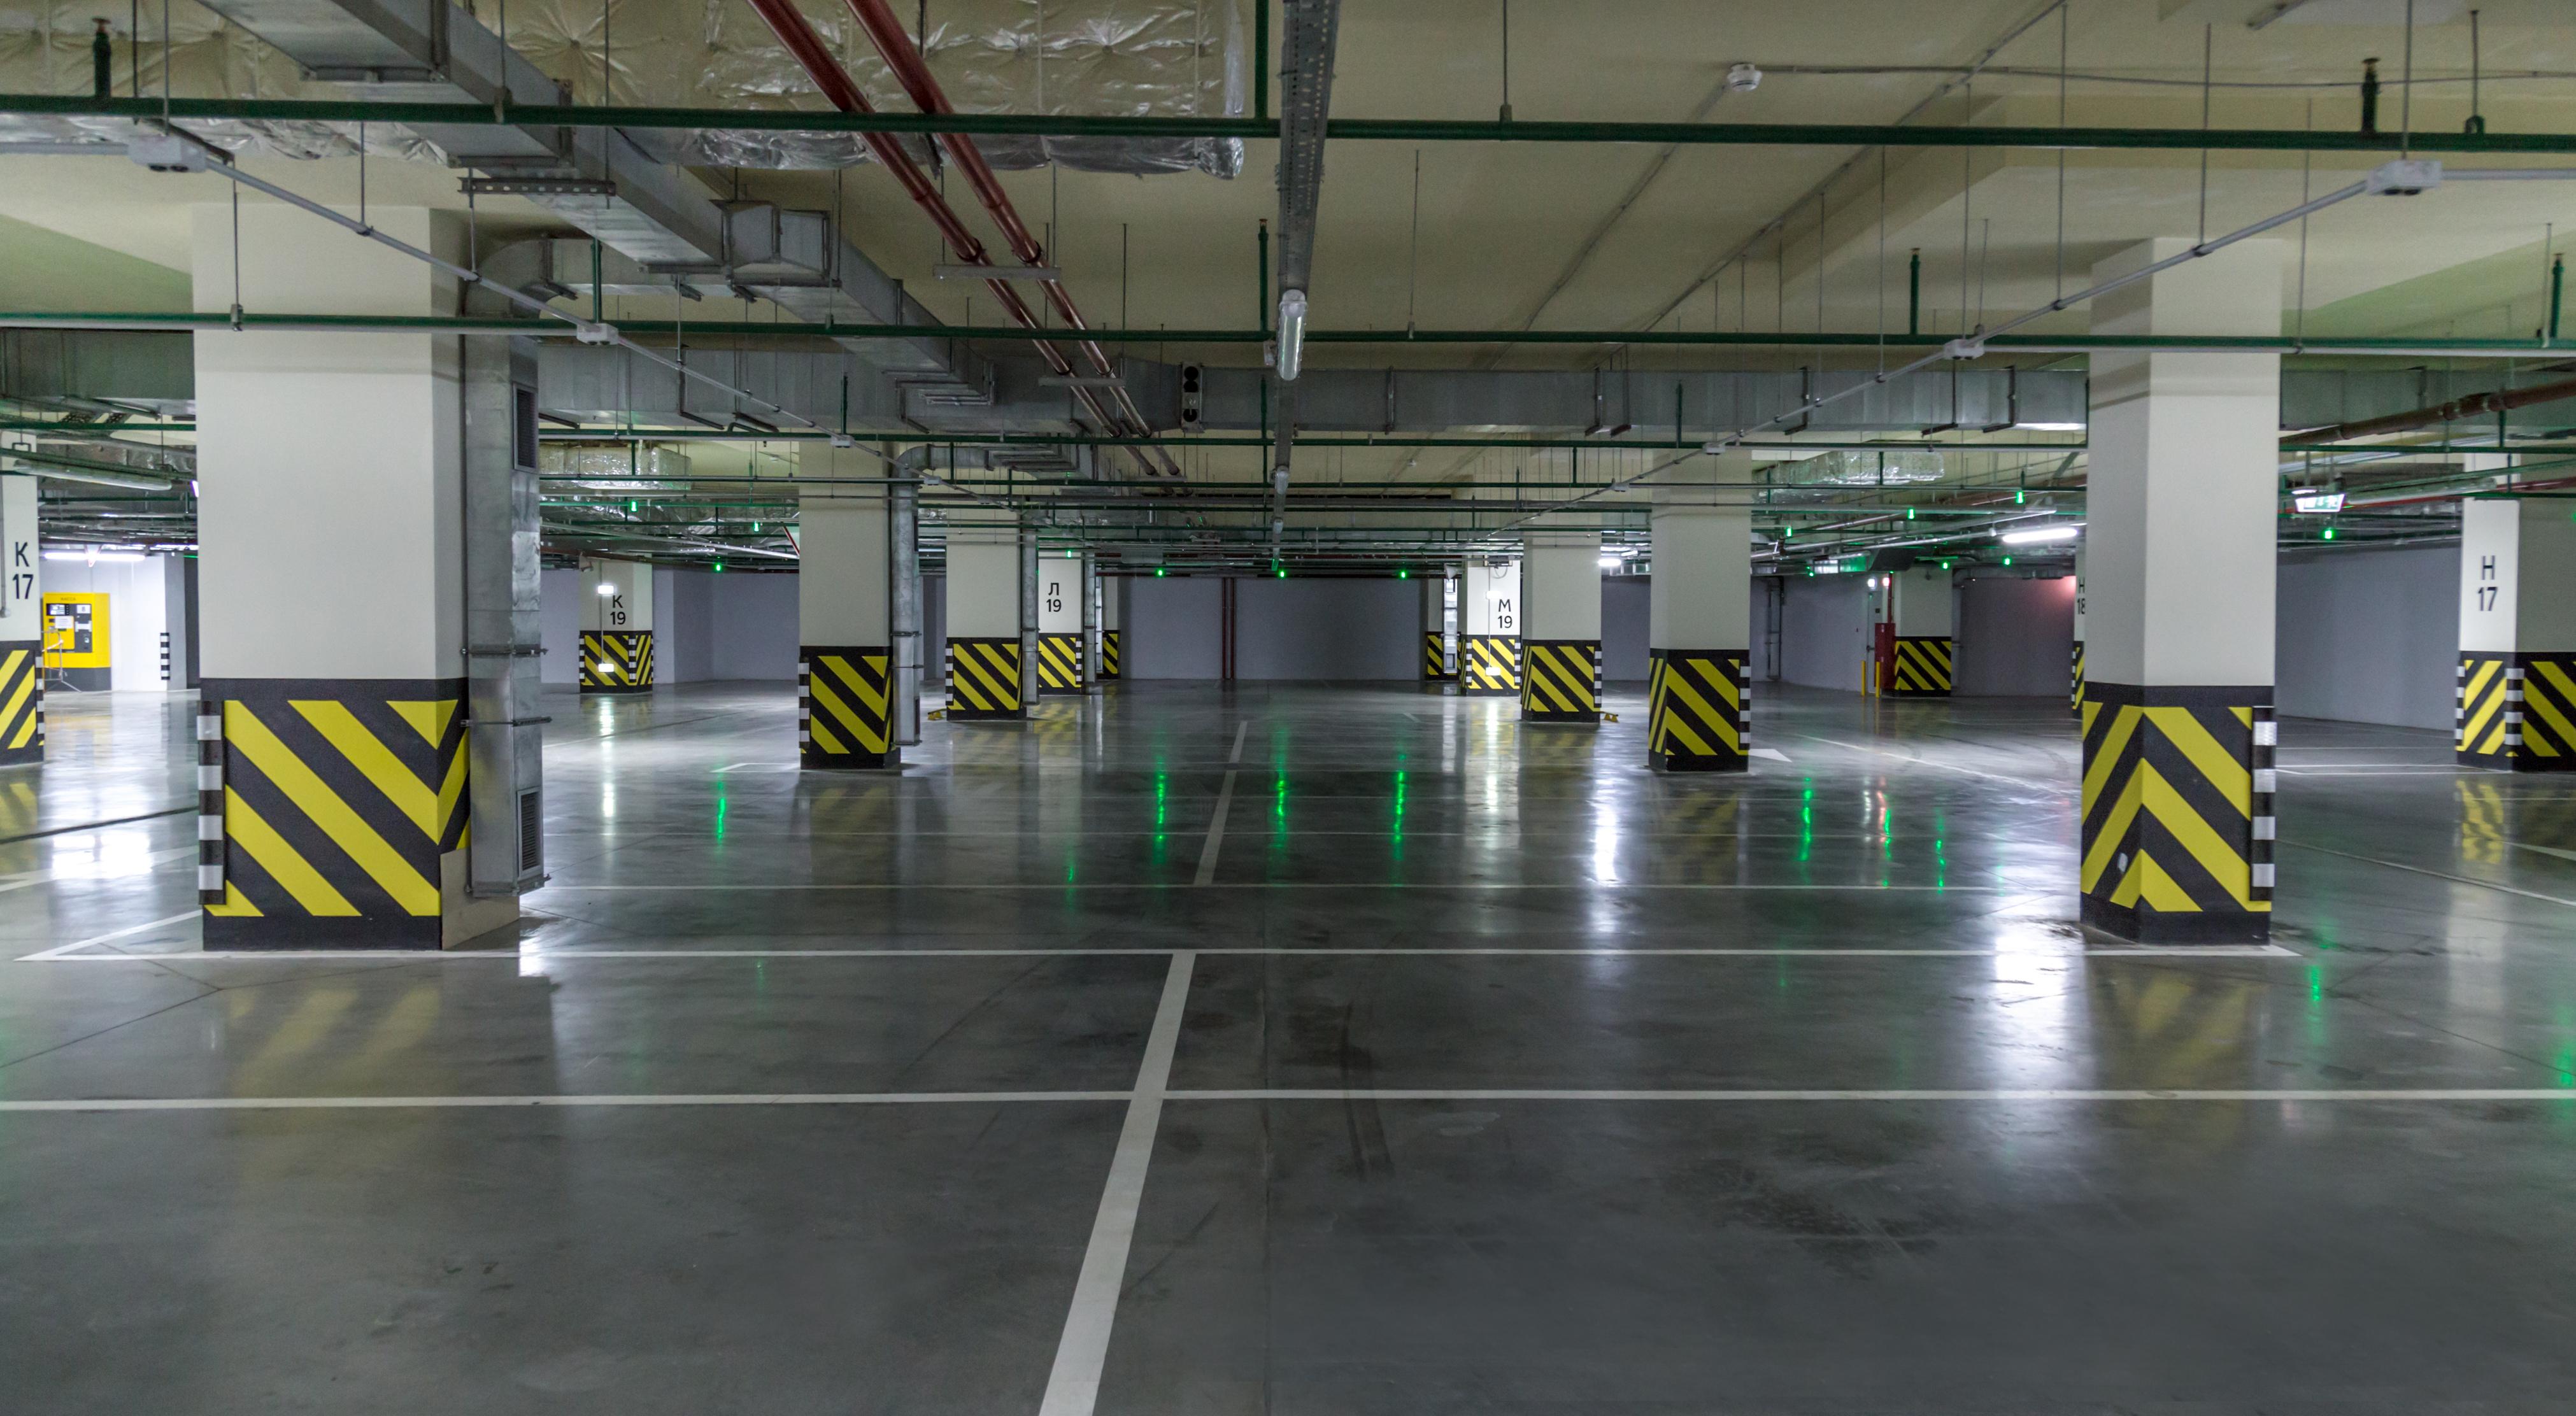 Empty parking lot. Urban, industrial background